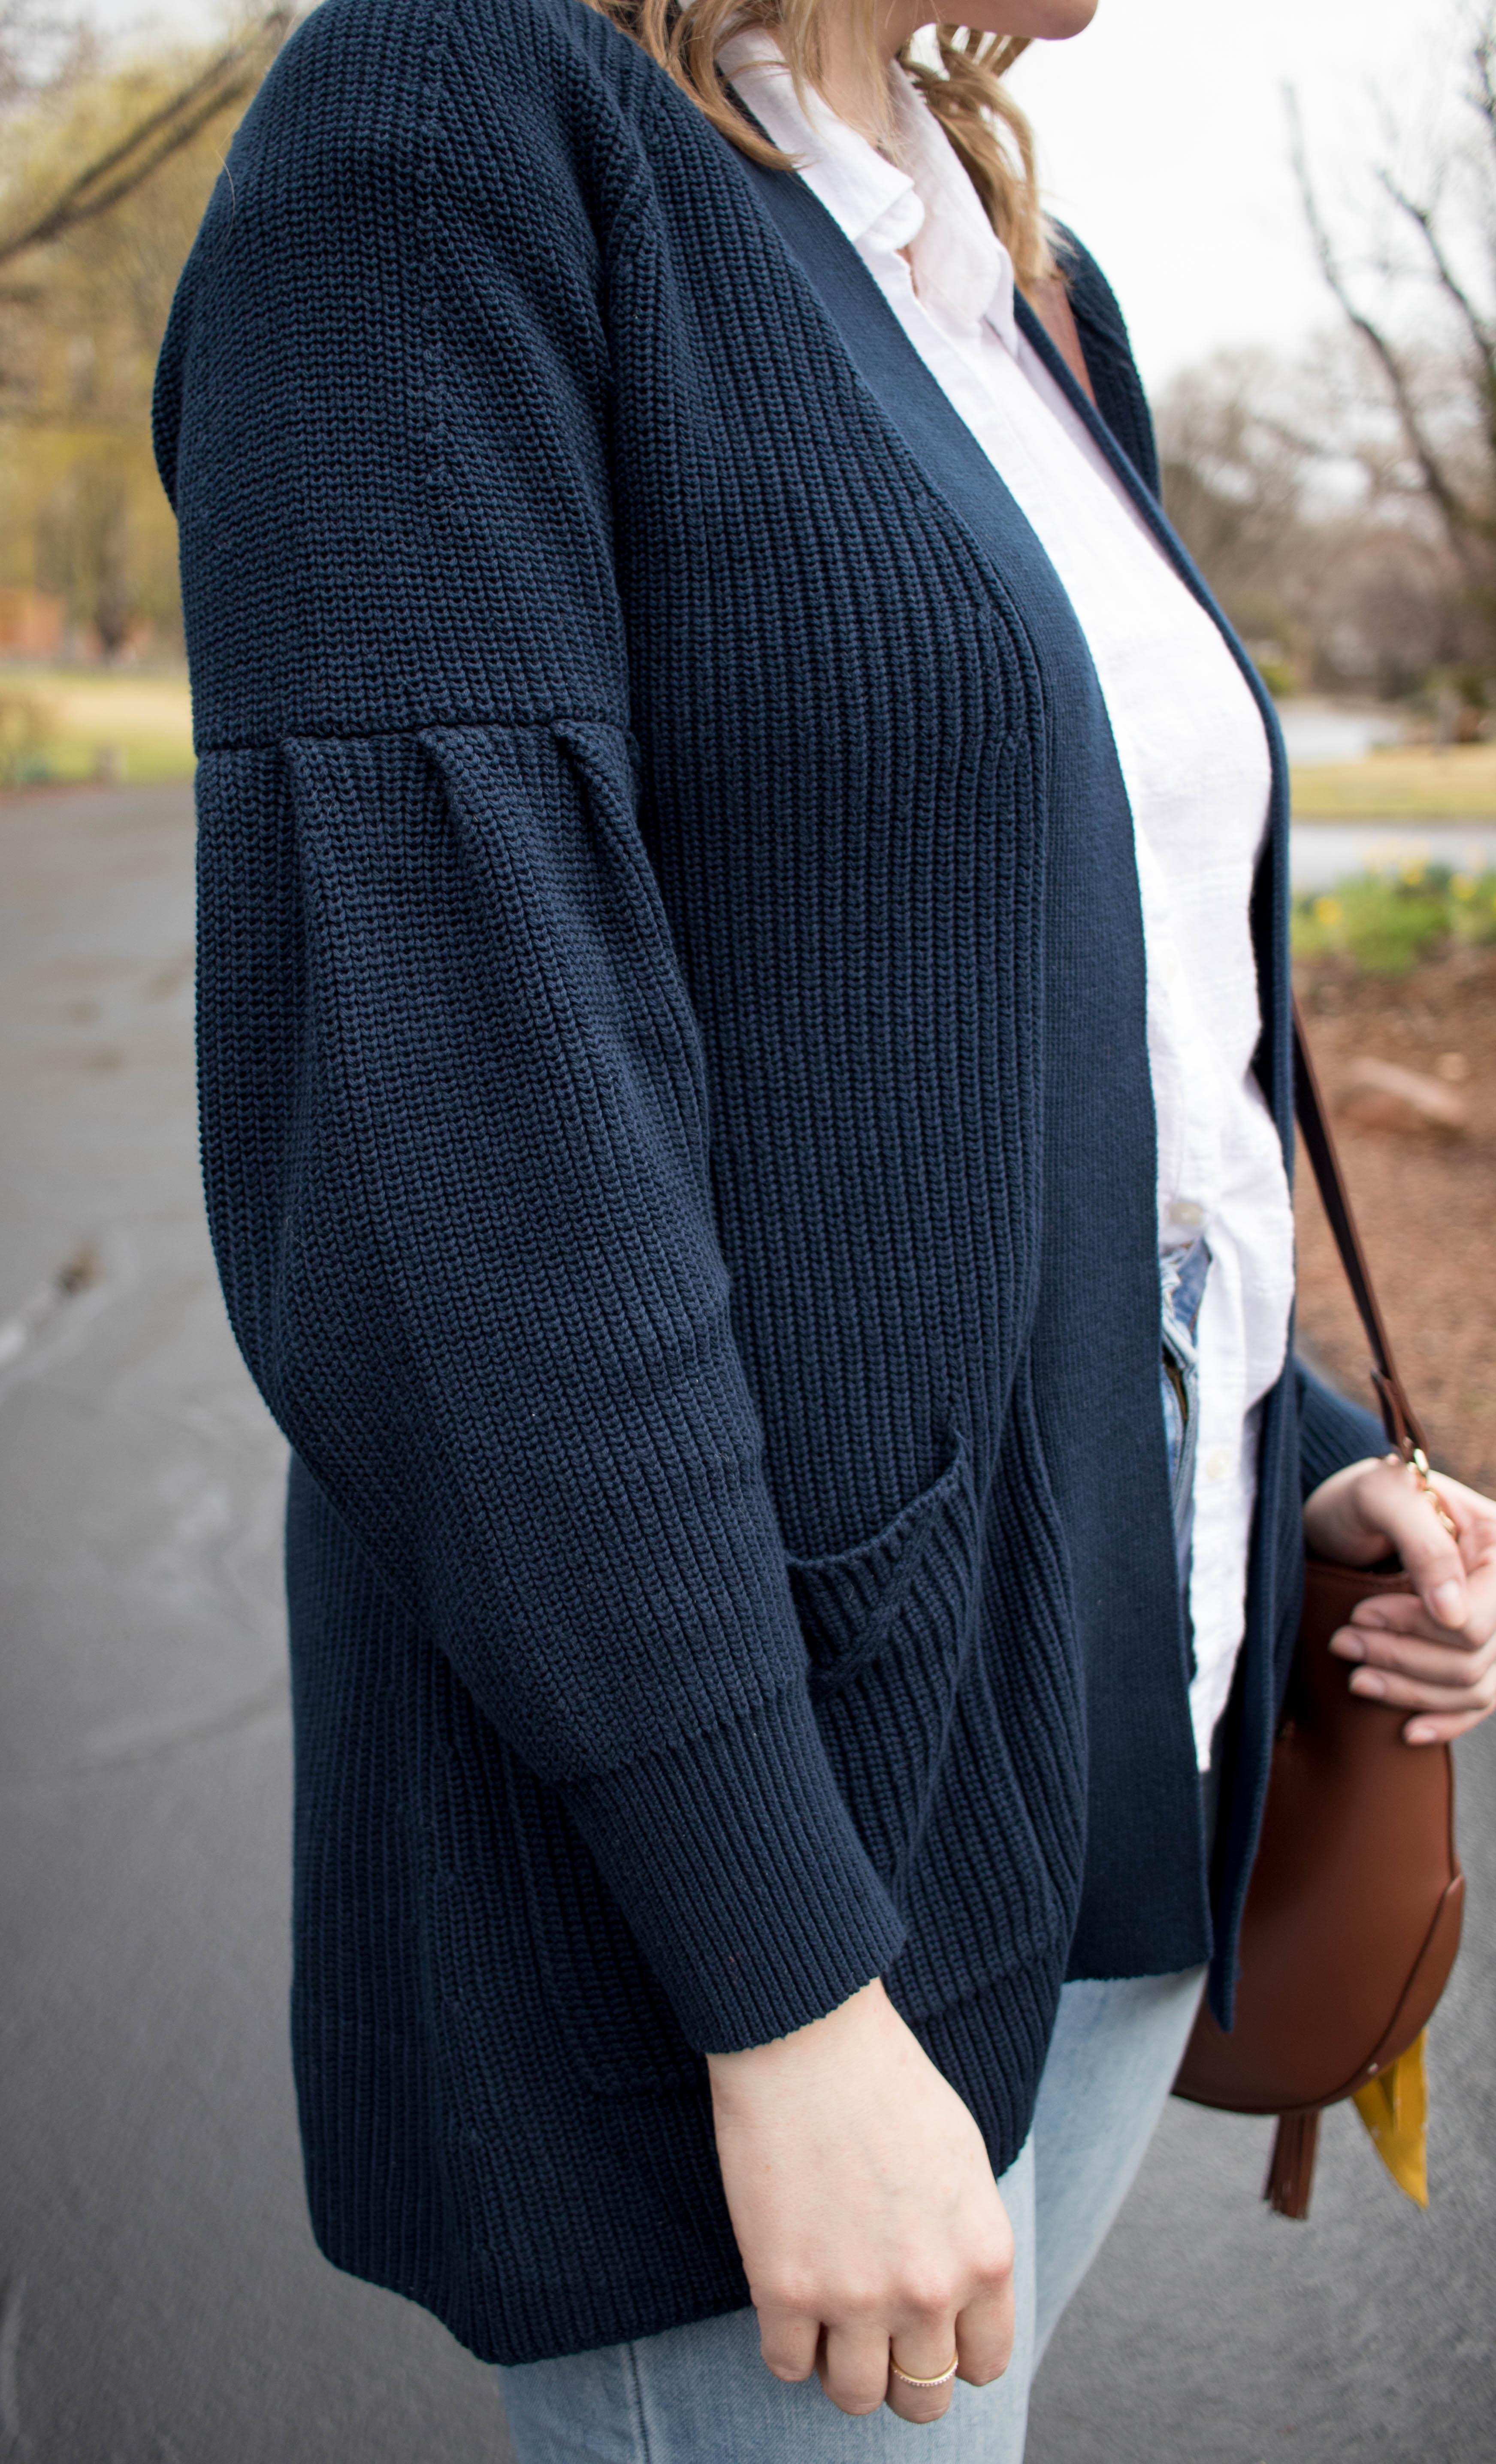 evy's tree Elizabeth navy cardigan #evystree #evystreepartner #outfitdetails